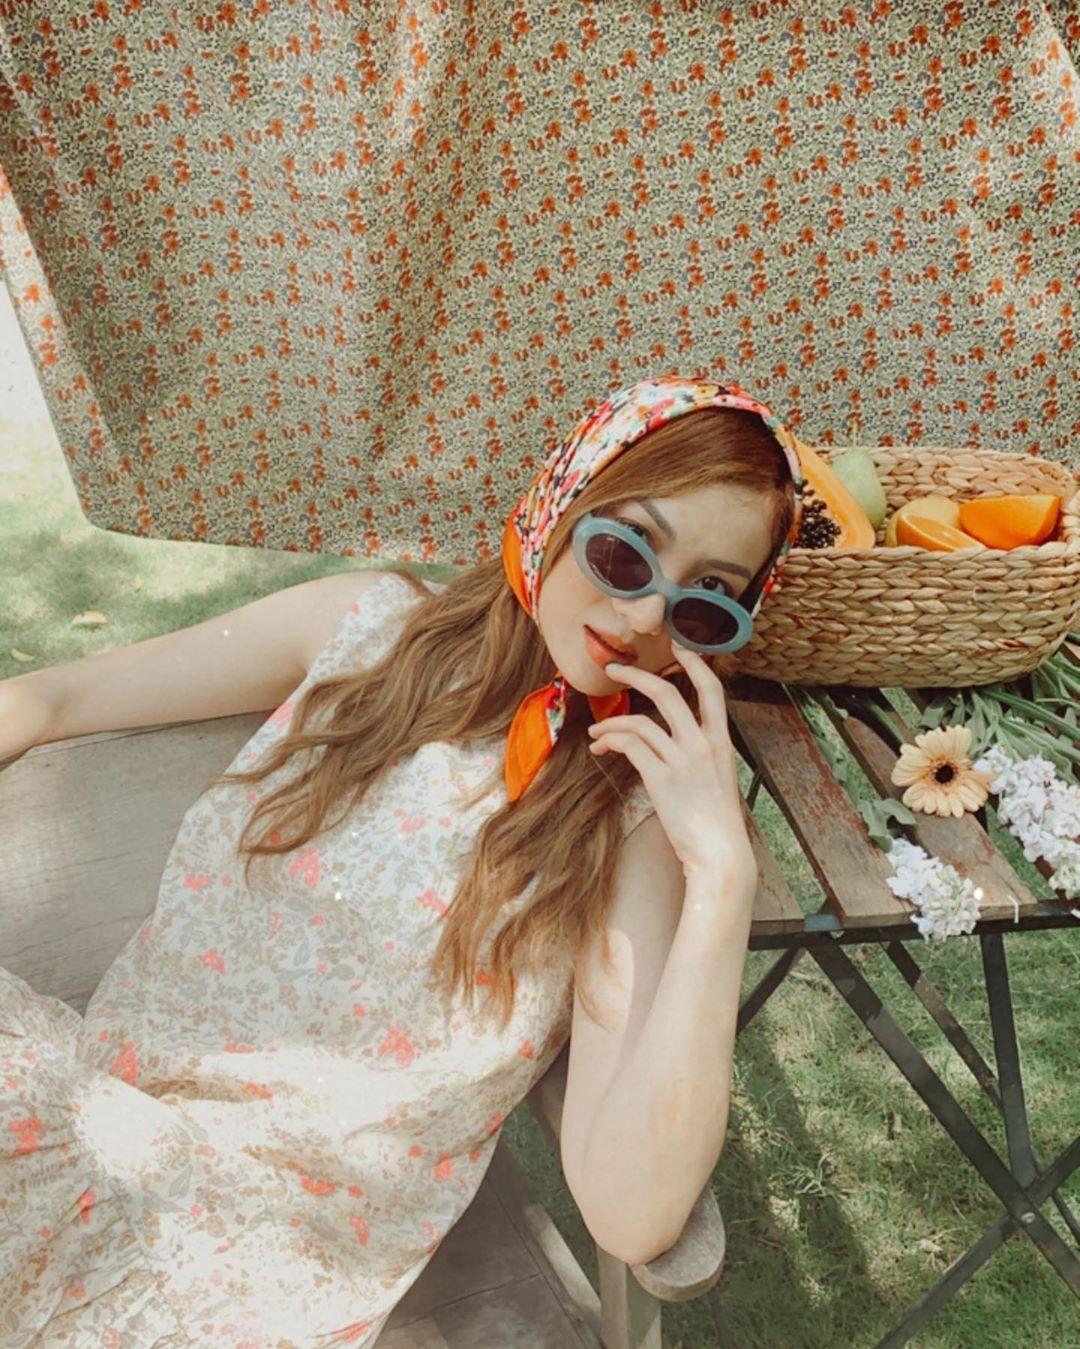 Yến Nhi mặc đầm hoa quấn khăn bandana hoa